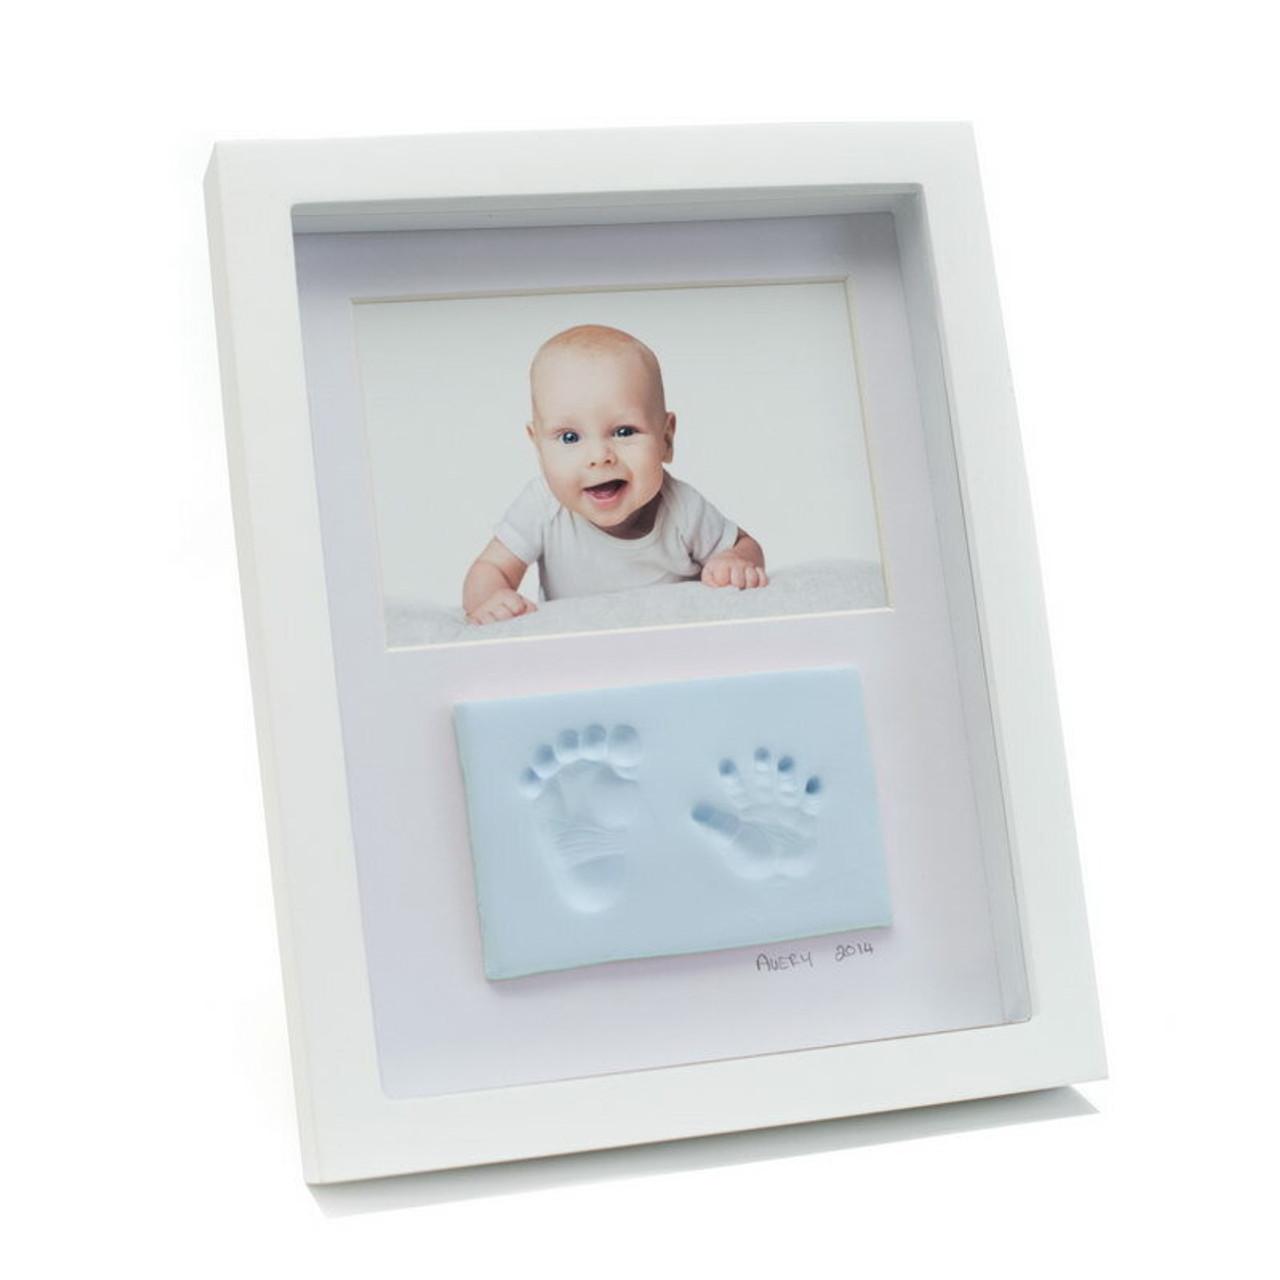 Baby Ink Soft Clay Keepsake Frame Impression Kit